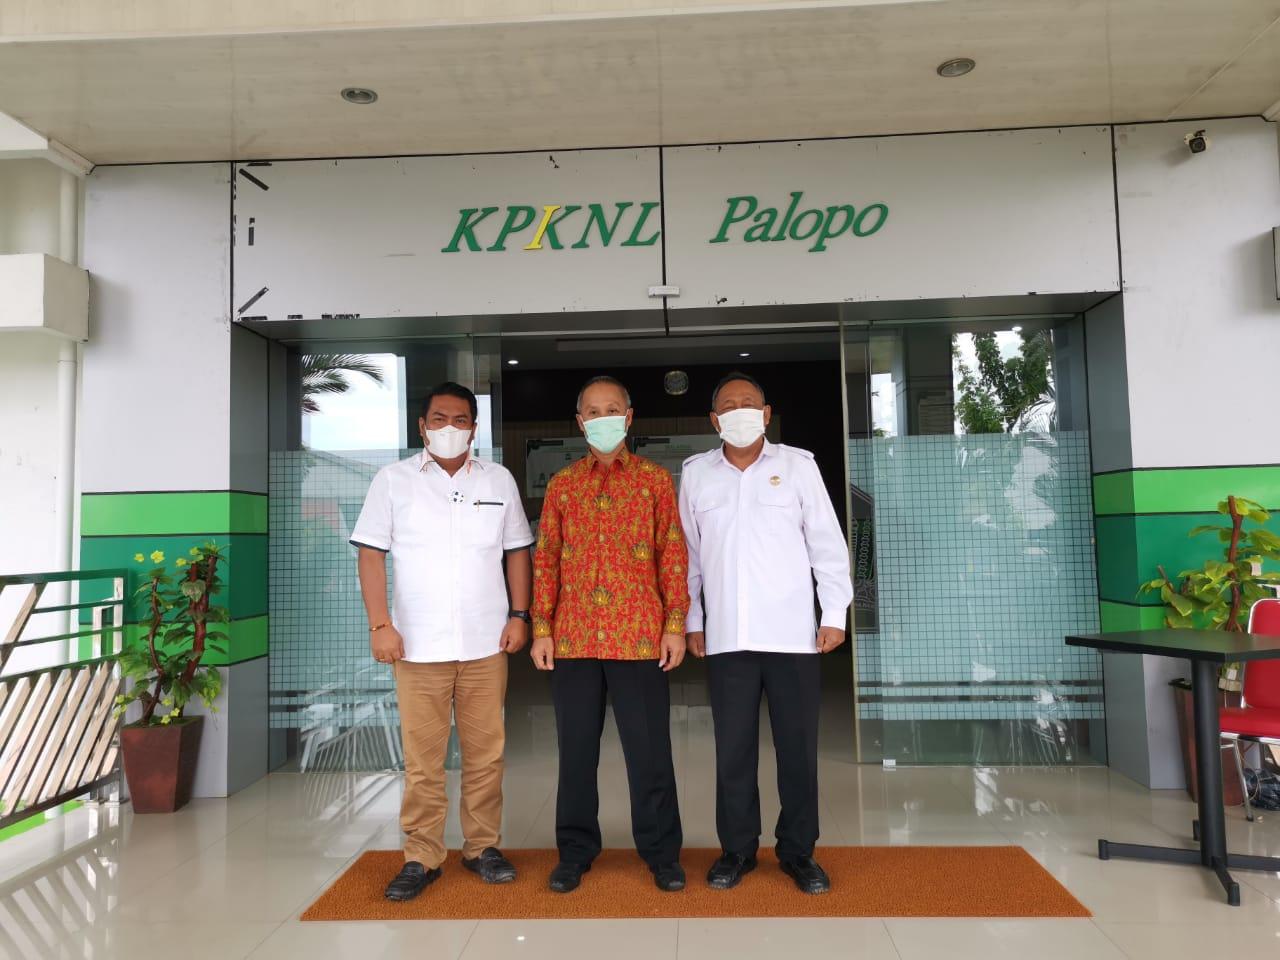 KPKNL Palopo Menerima Kunjungan Bupati, Wakil Bupati dan Kepala BPKAD Kabupaten Toraja Utara